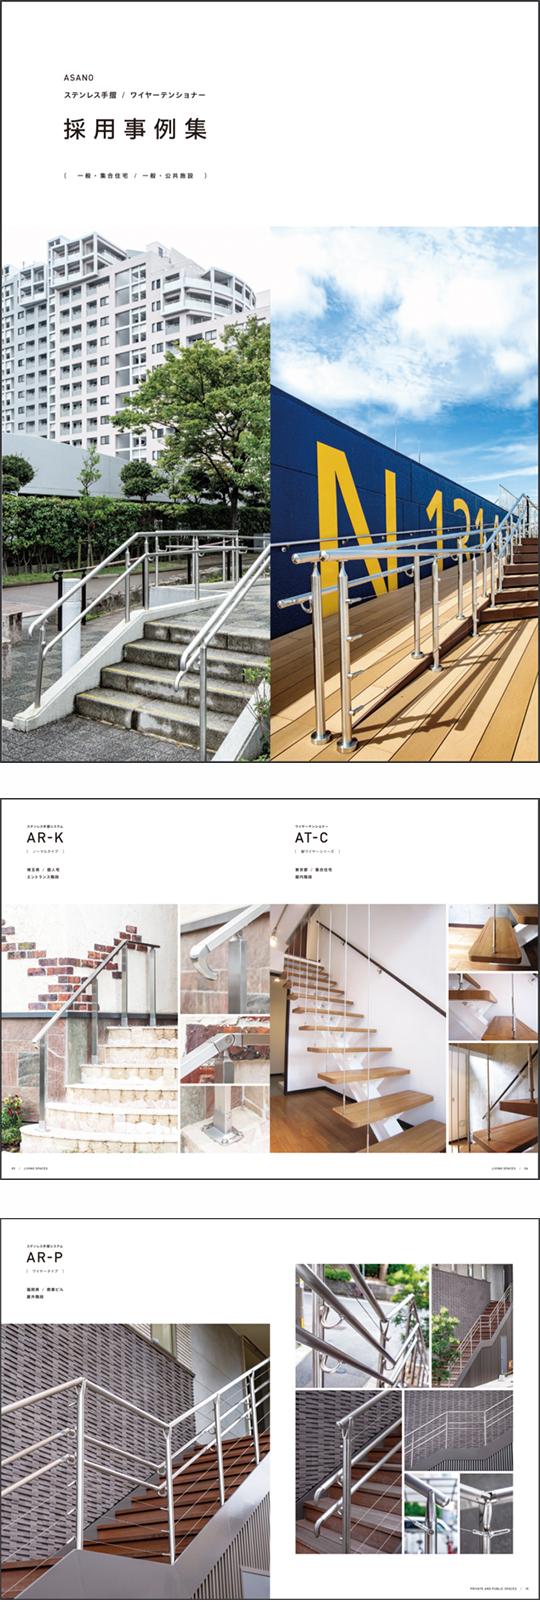 ASANO「ステンレス手摺/ワイヤーテンショナー」採用事例集 製品紹介